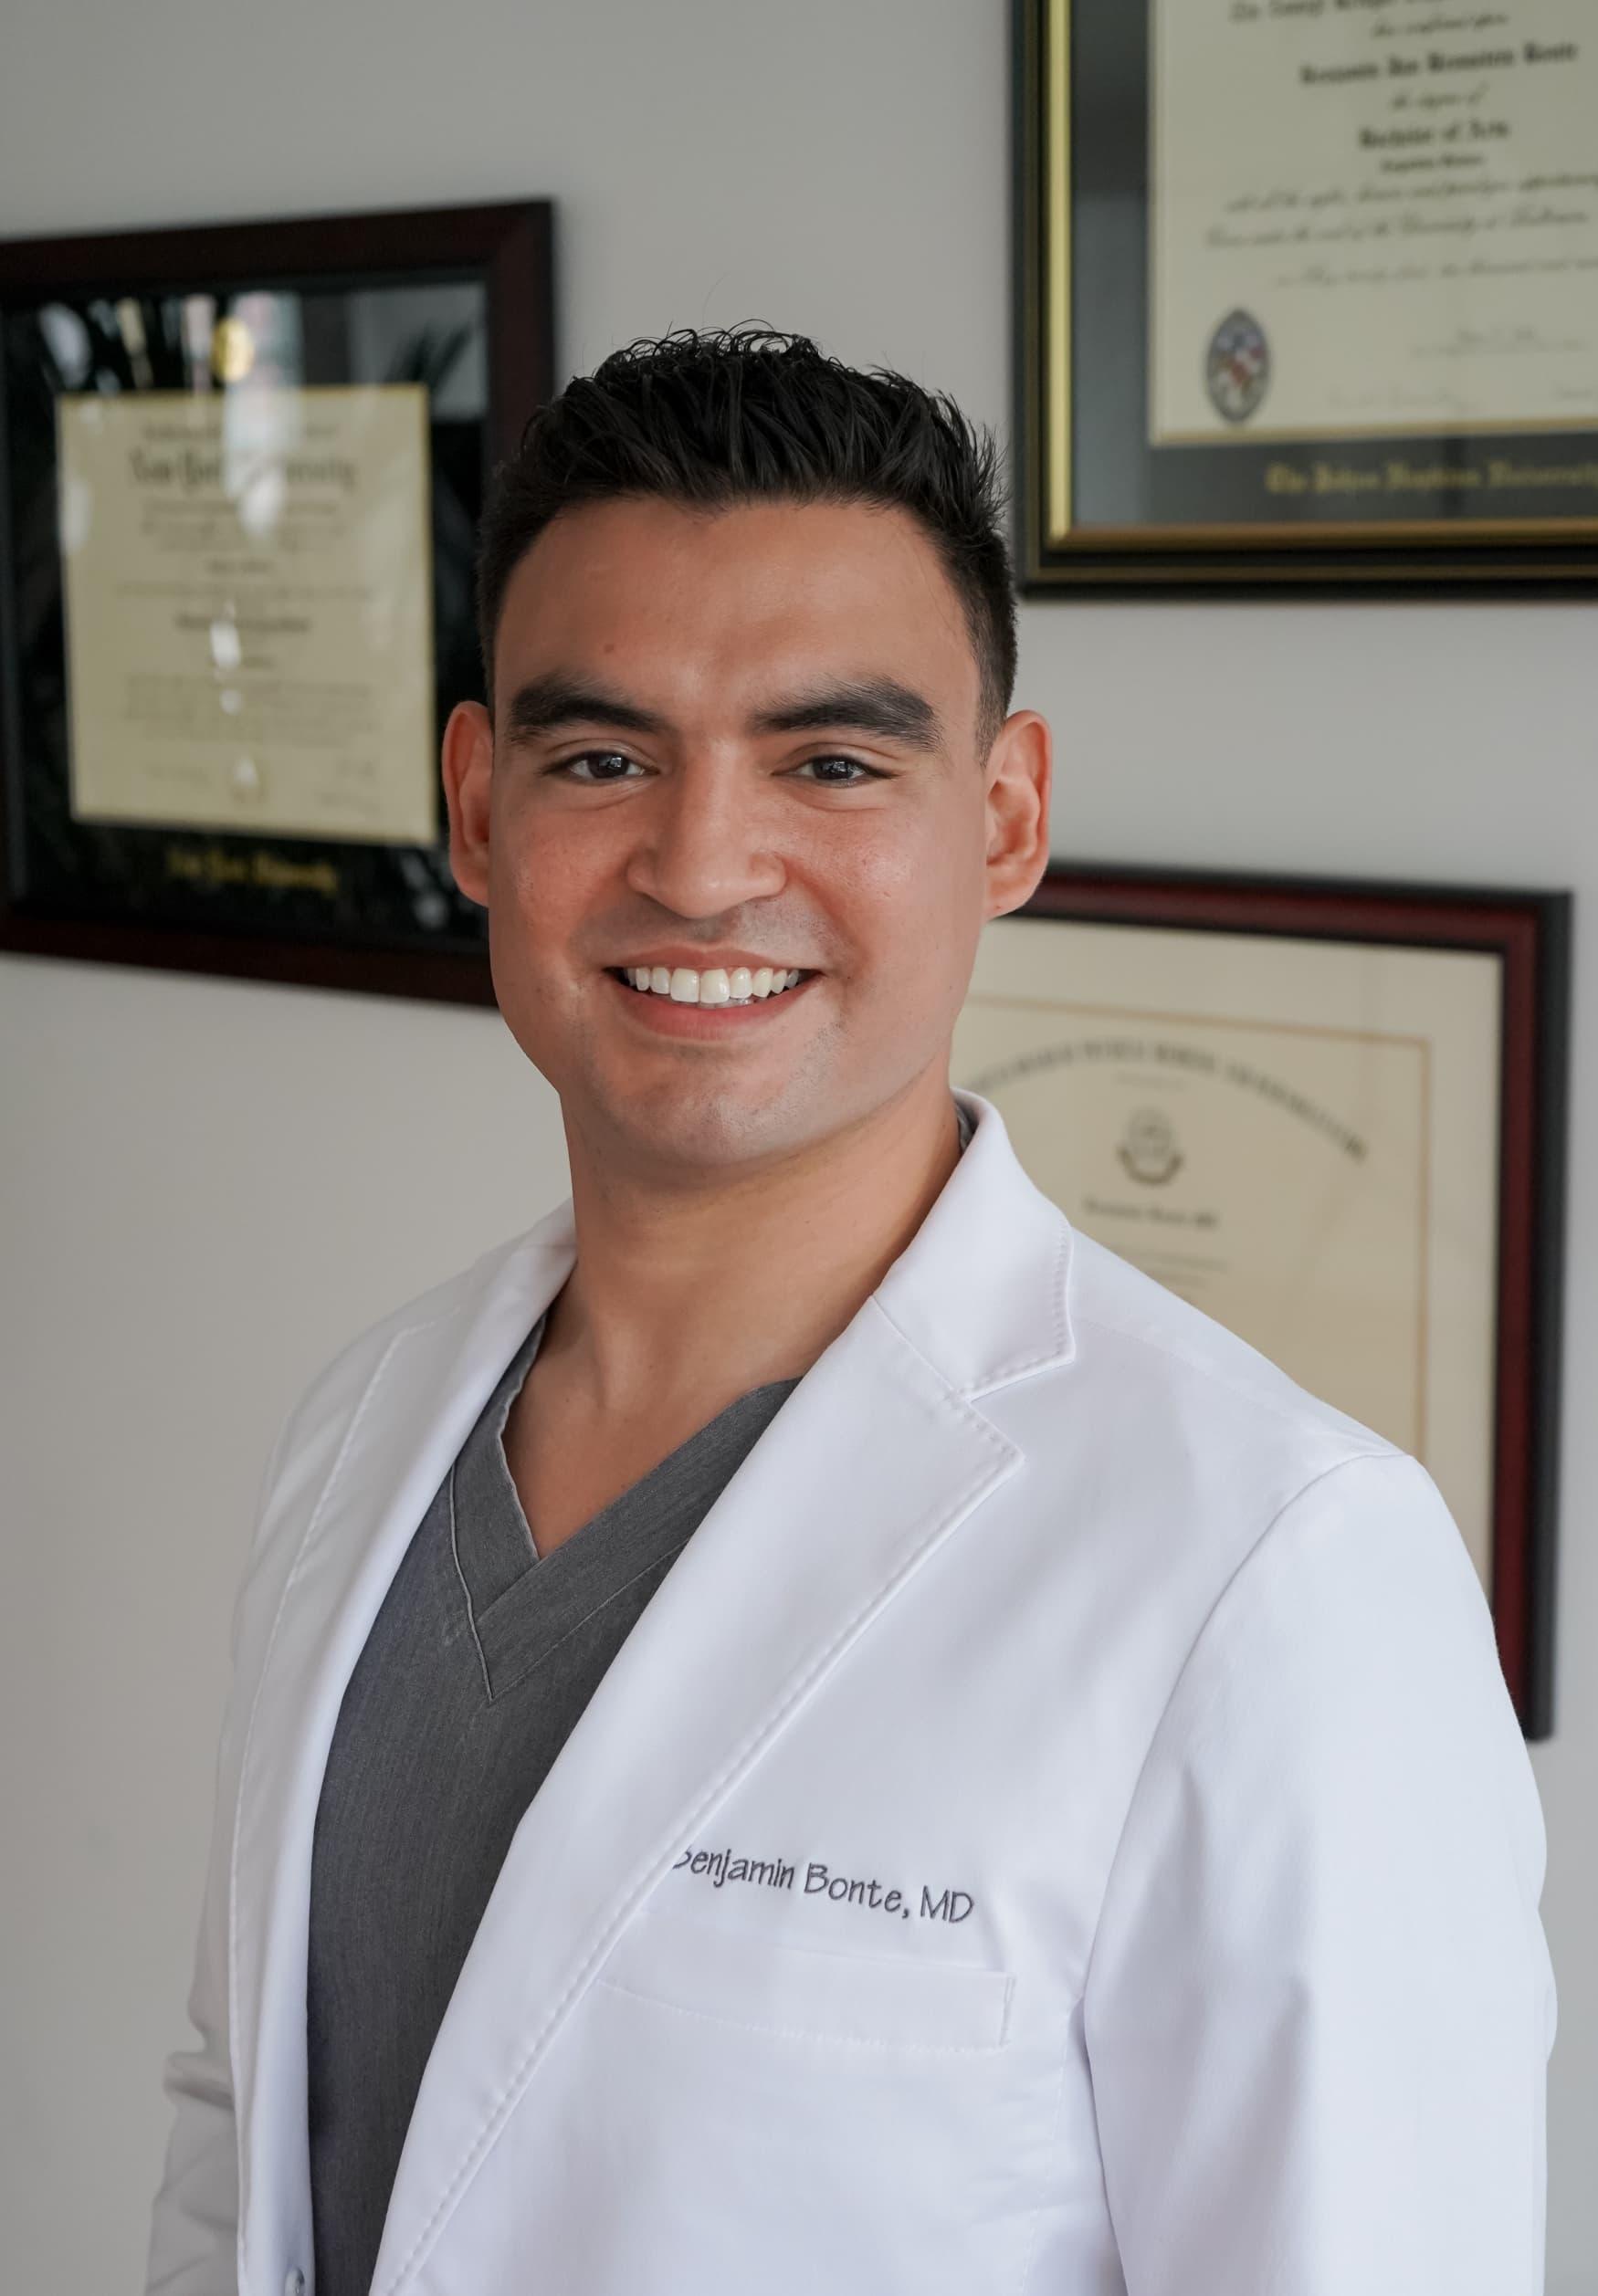 Dr. Bonte smiling in lab coat